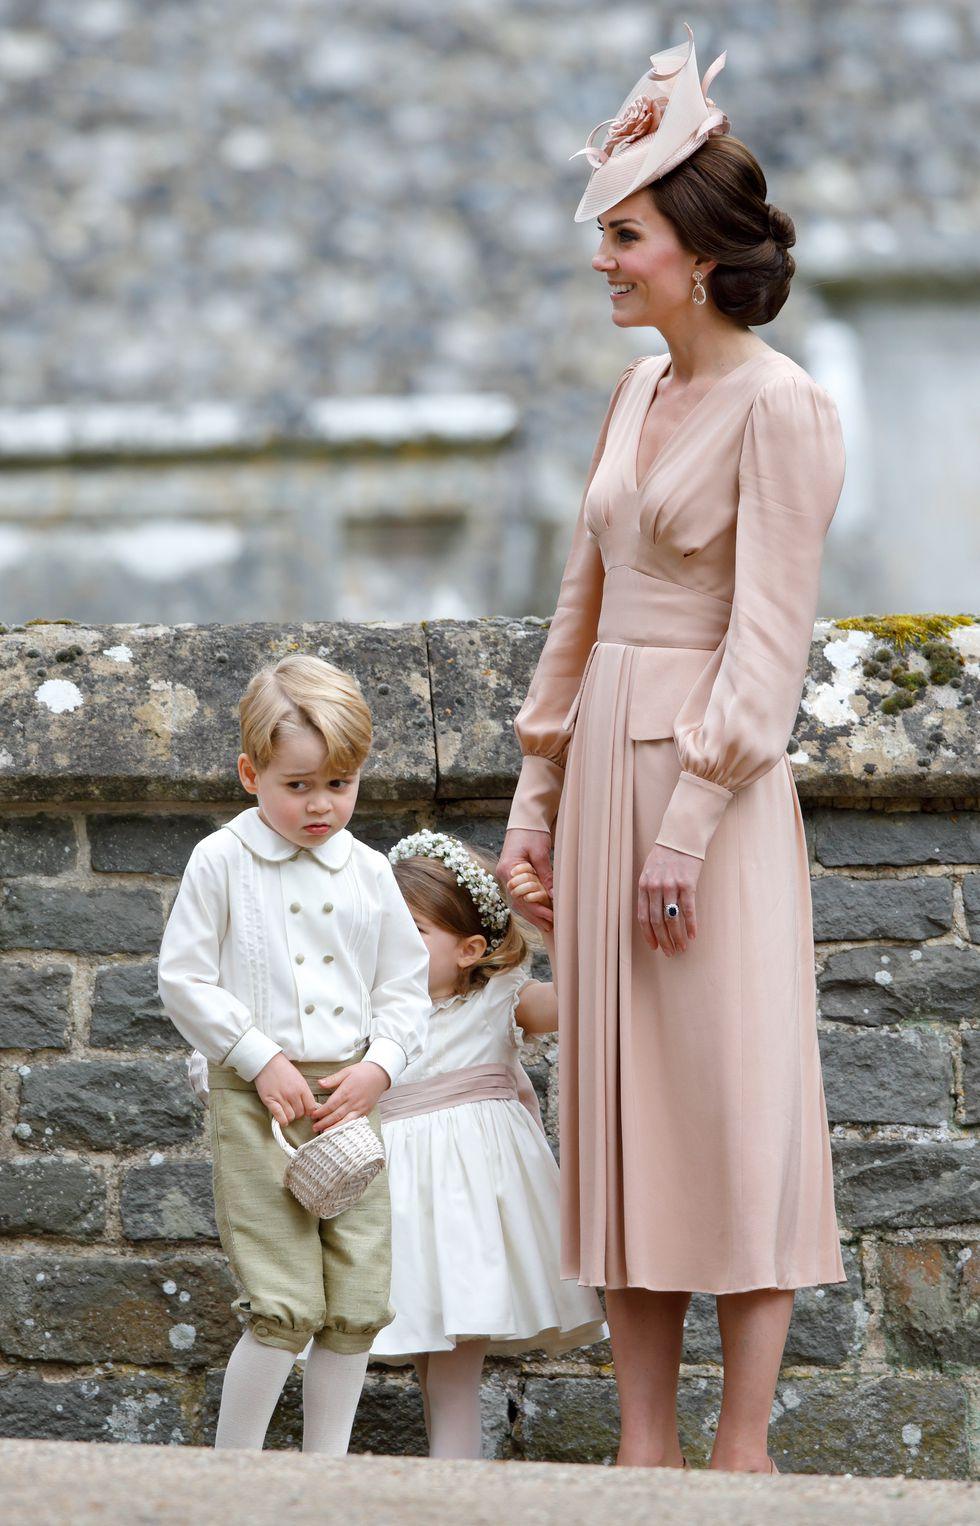 20 mai 2017 - la nunta mătusii sale, Pippa Middleton